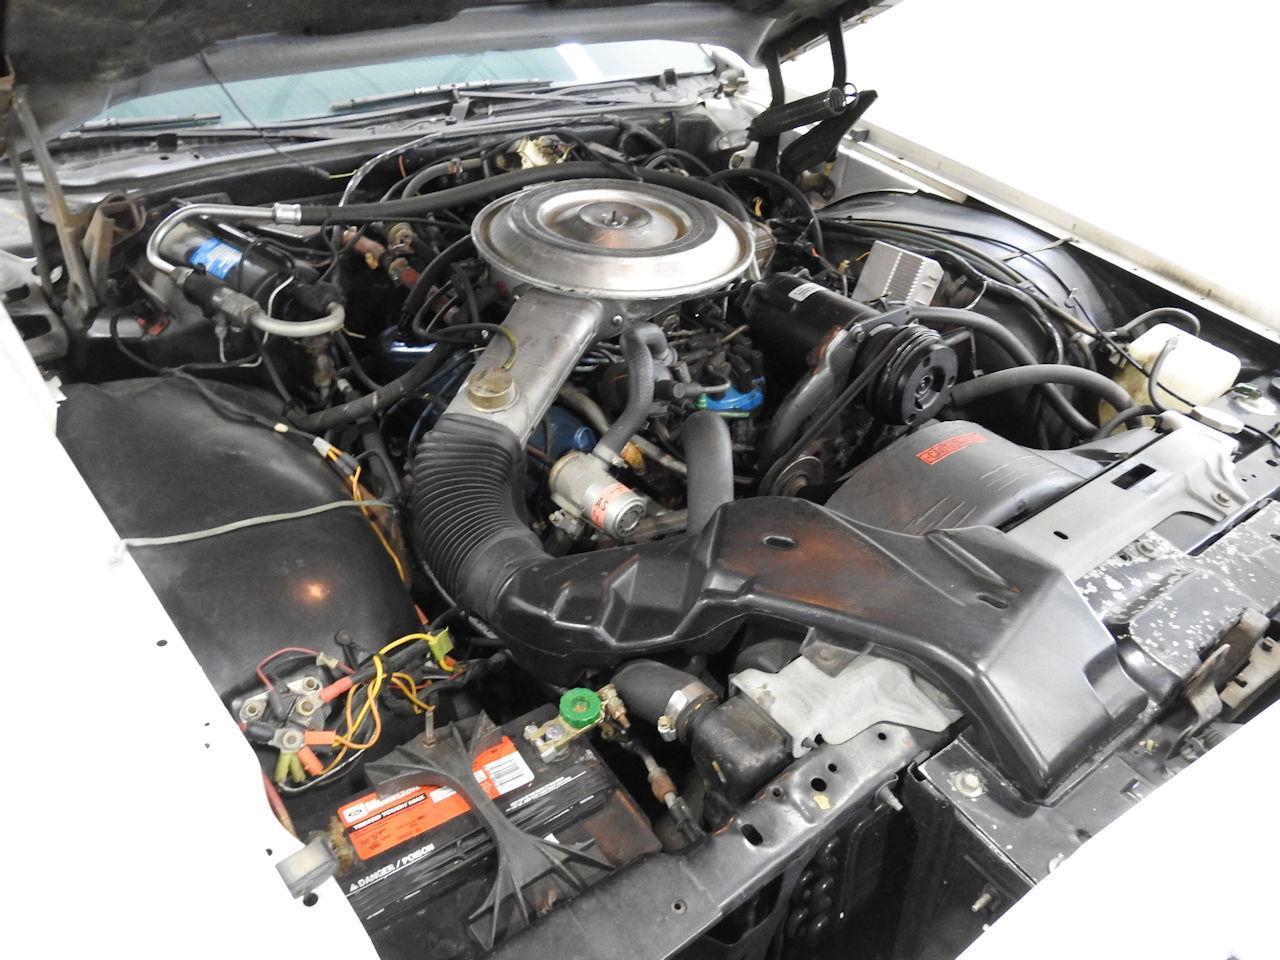 1979 Lincoln MKV 76